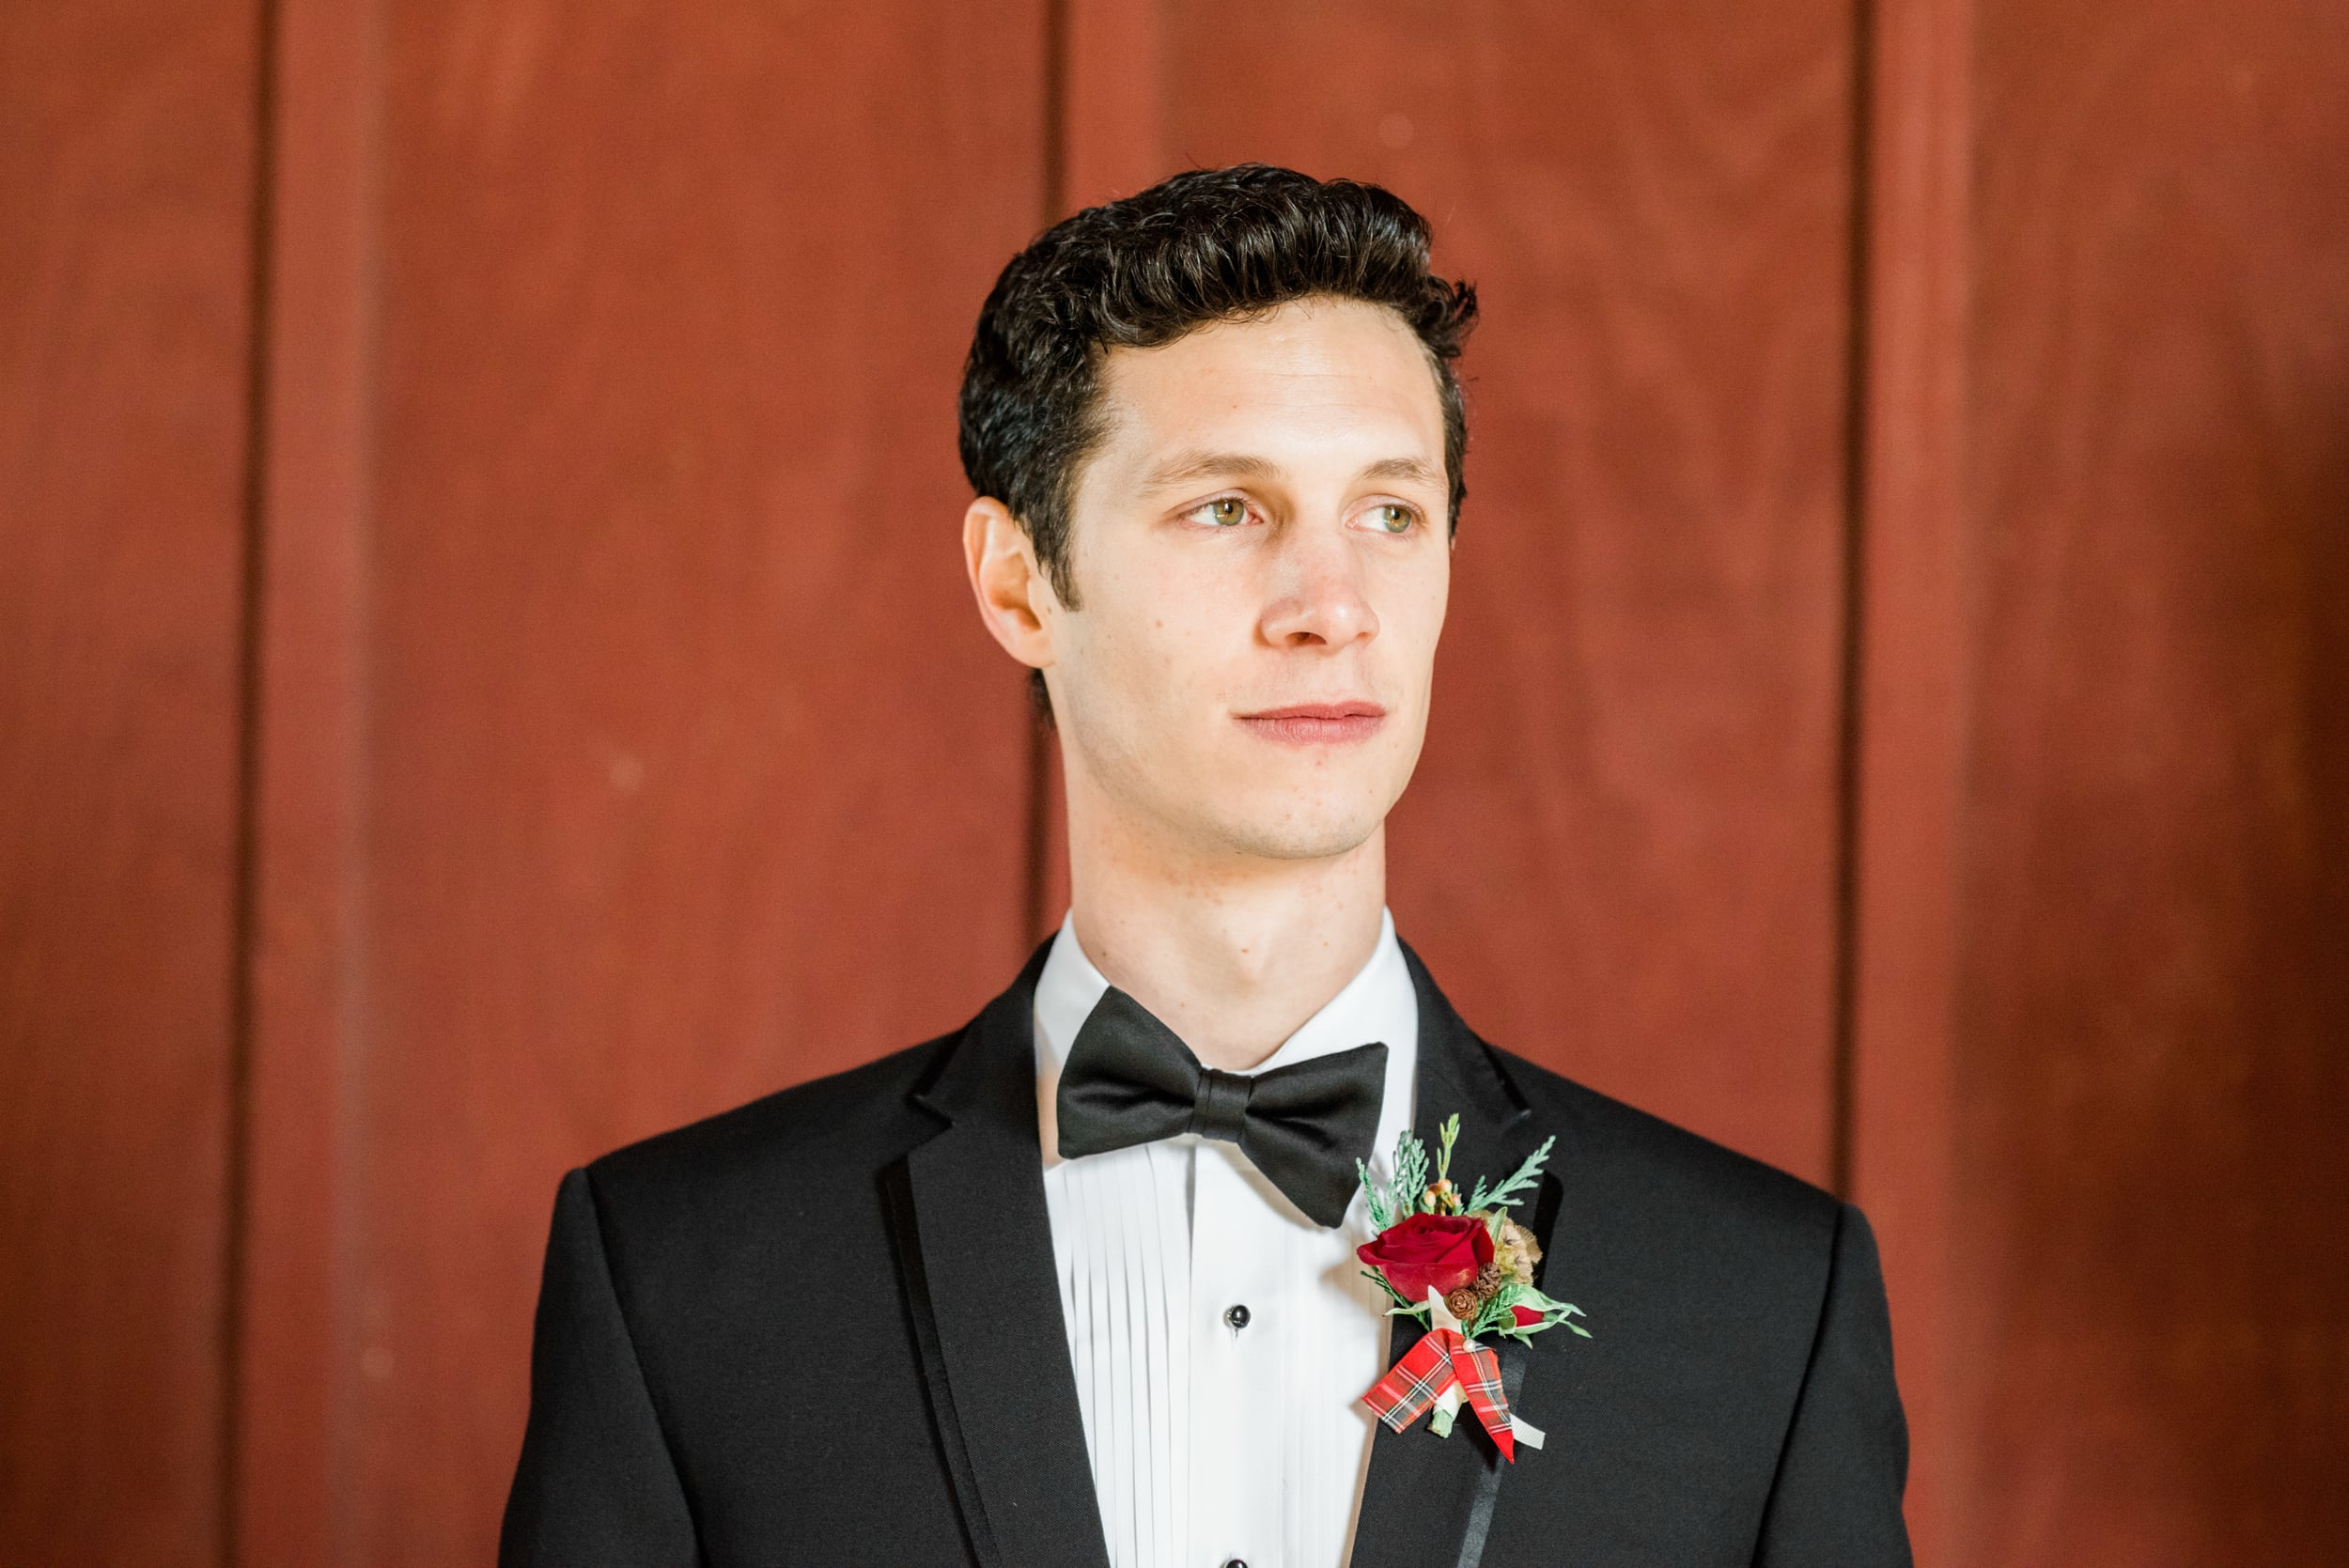 Natalie_Schutt_Photography_Winter_Wedding_San_Luis_Obispo-10.jpg